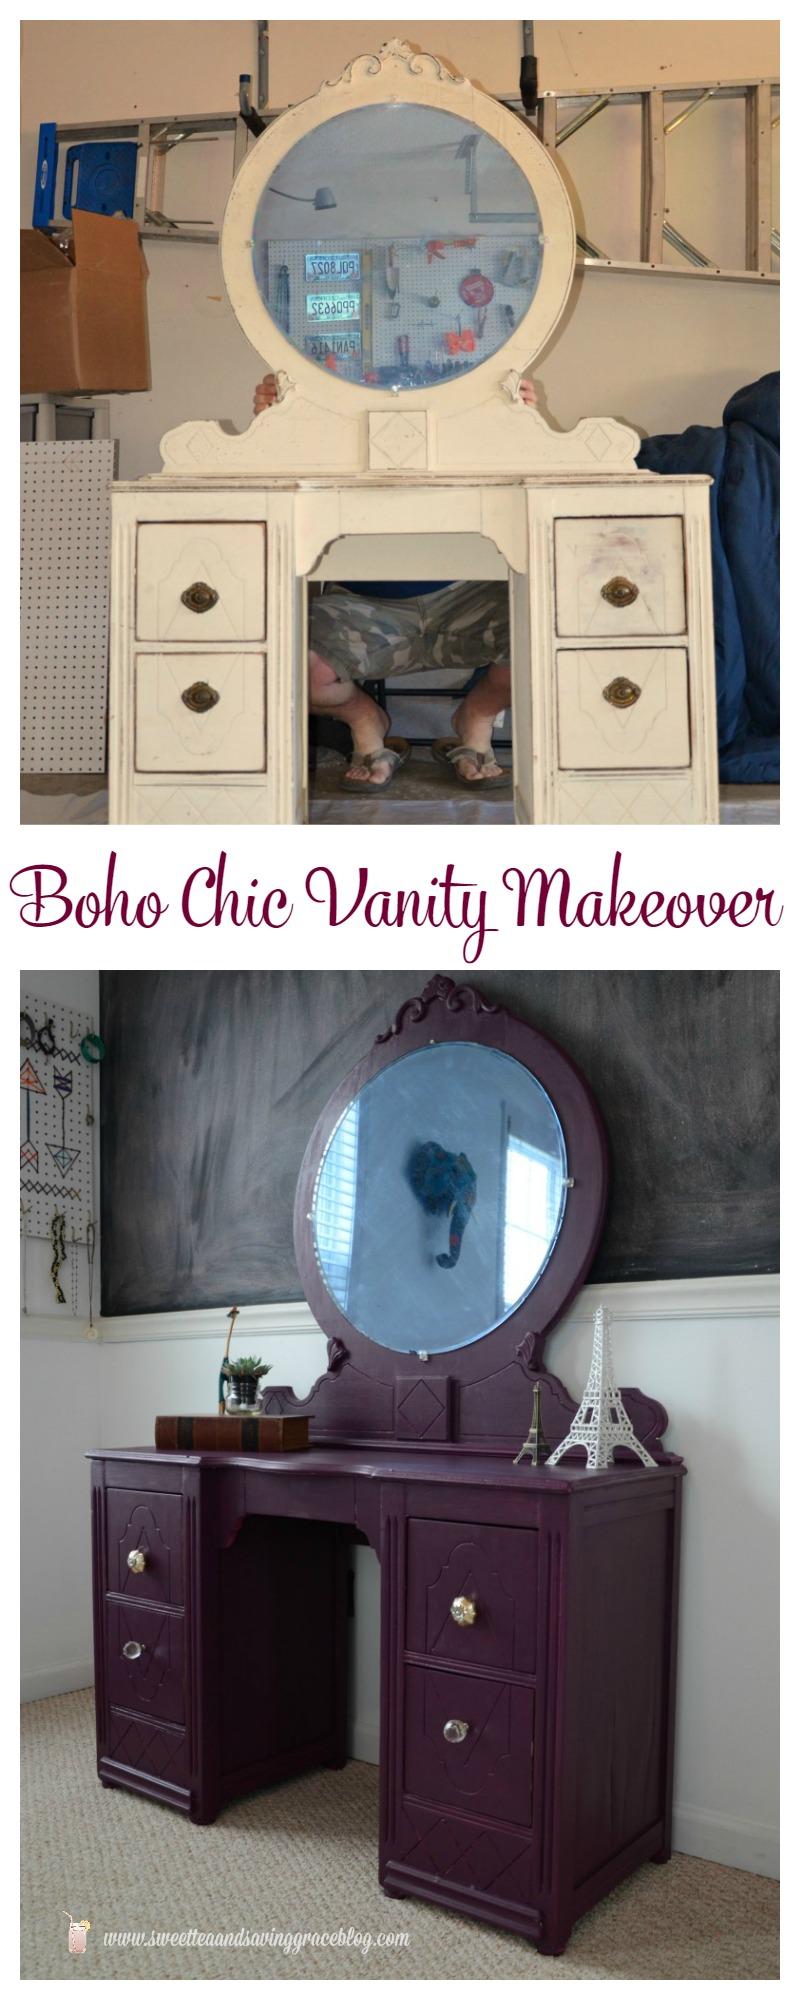 Boho Chic Vanity Makeover